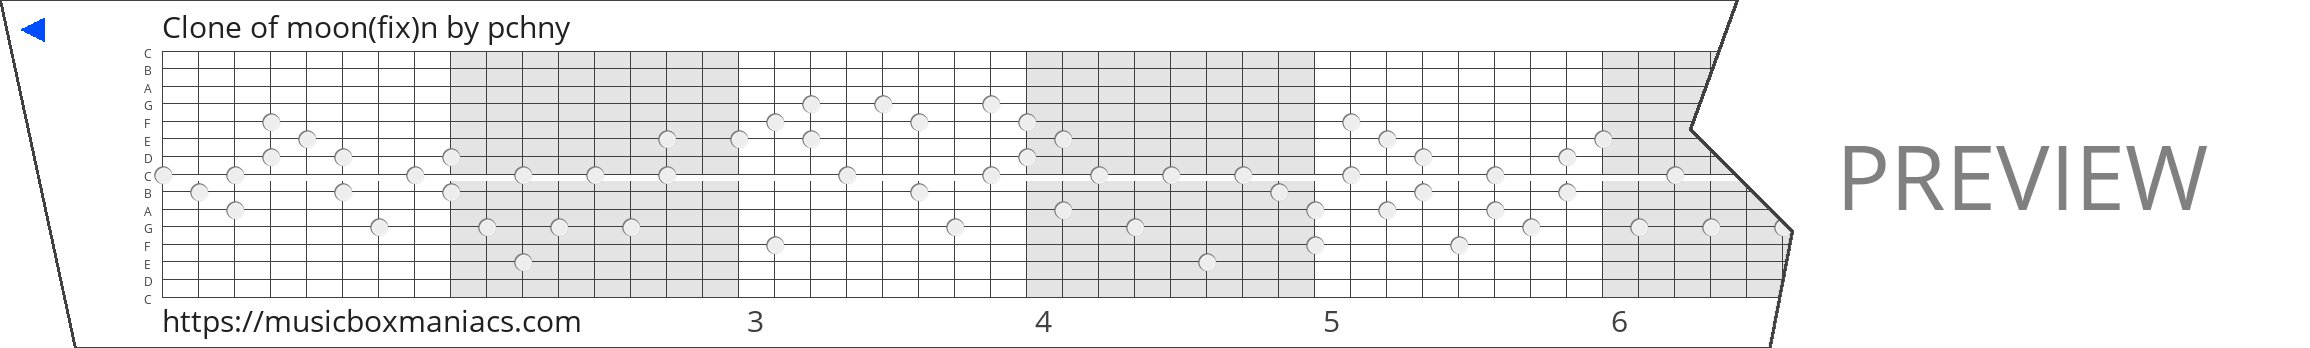 Clone of moon(fix)n 15 note music box paper strip